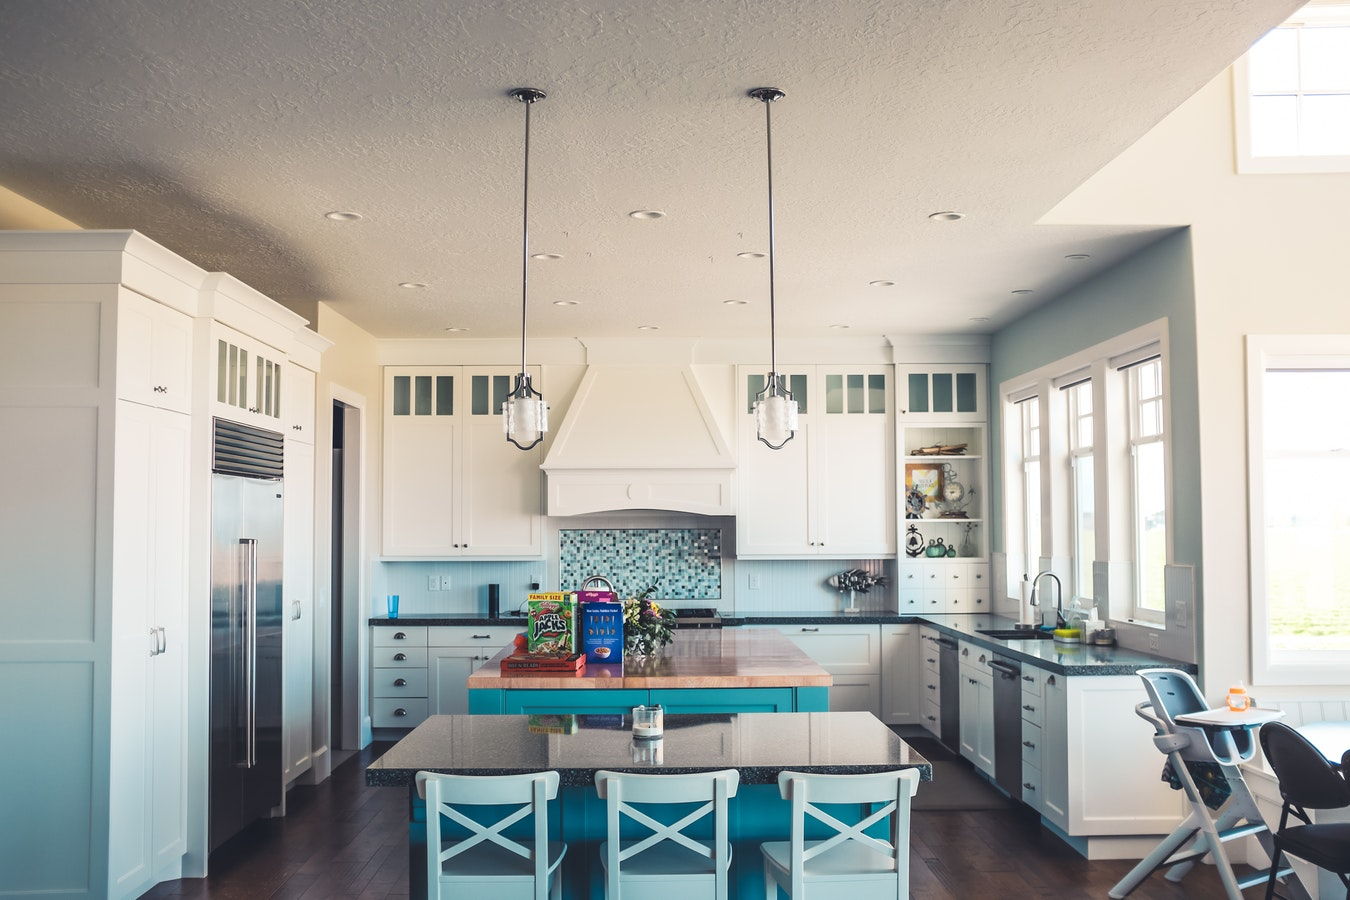 кредиты на покупку недвижимости за рубежом